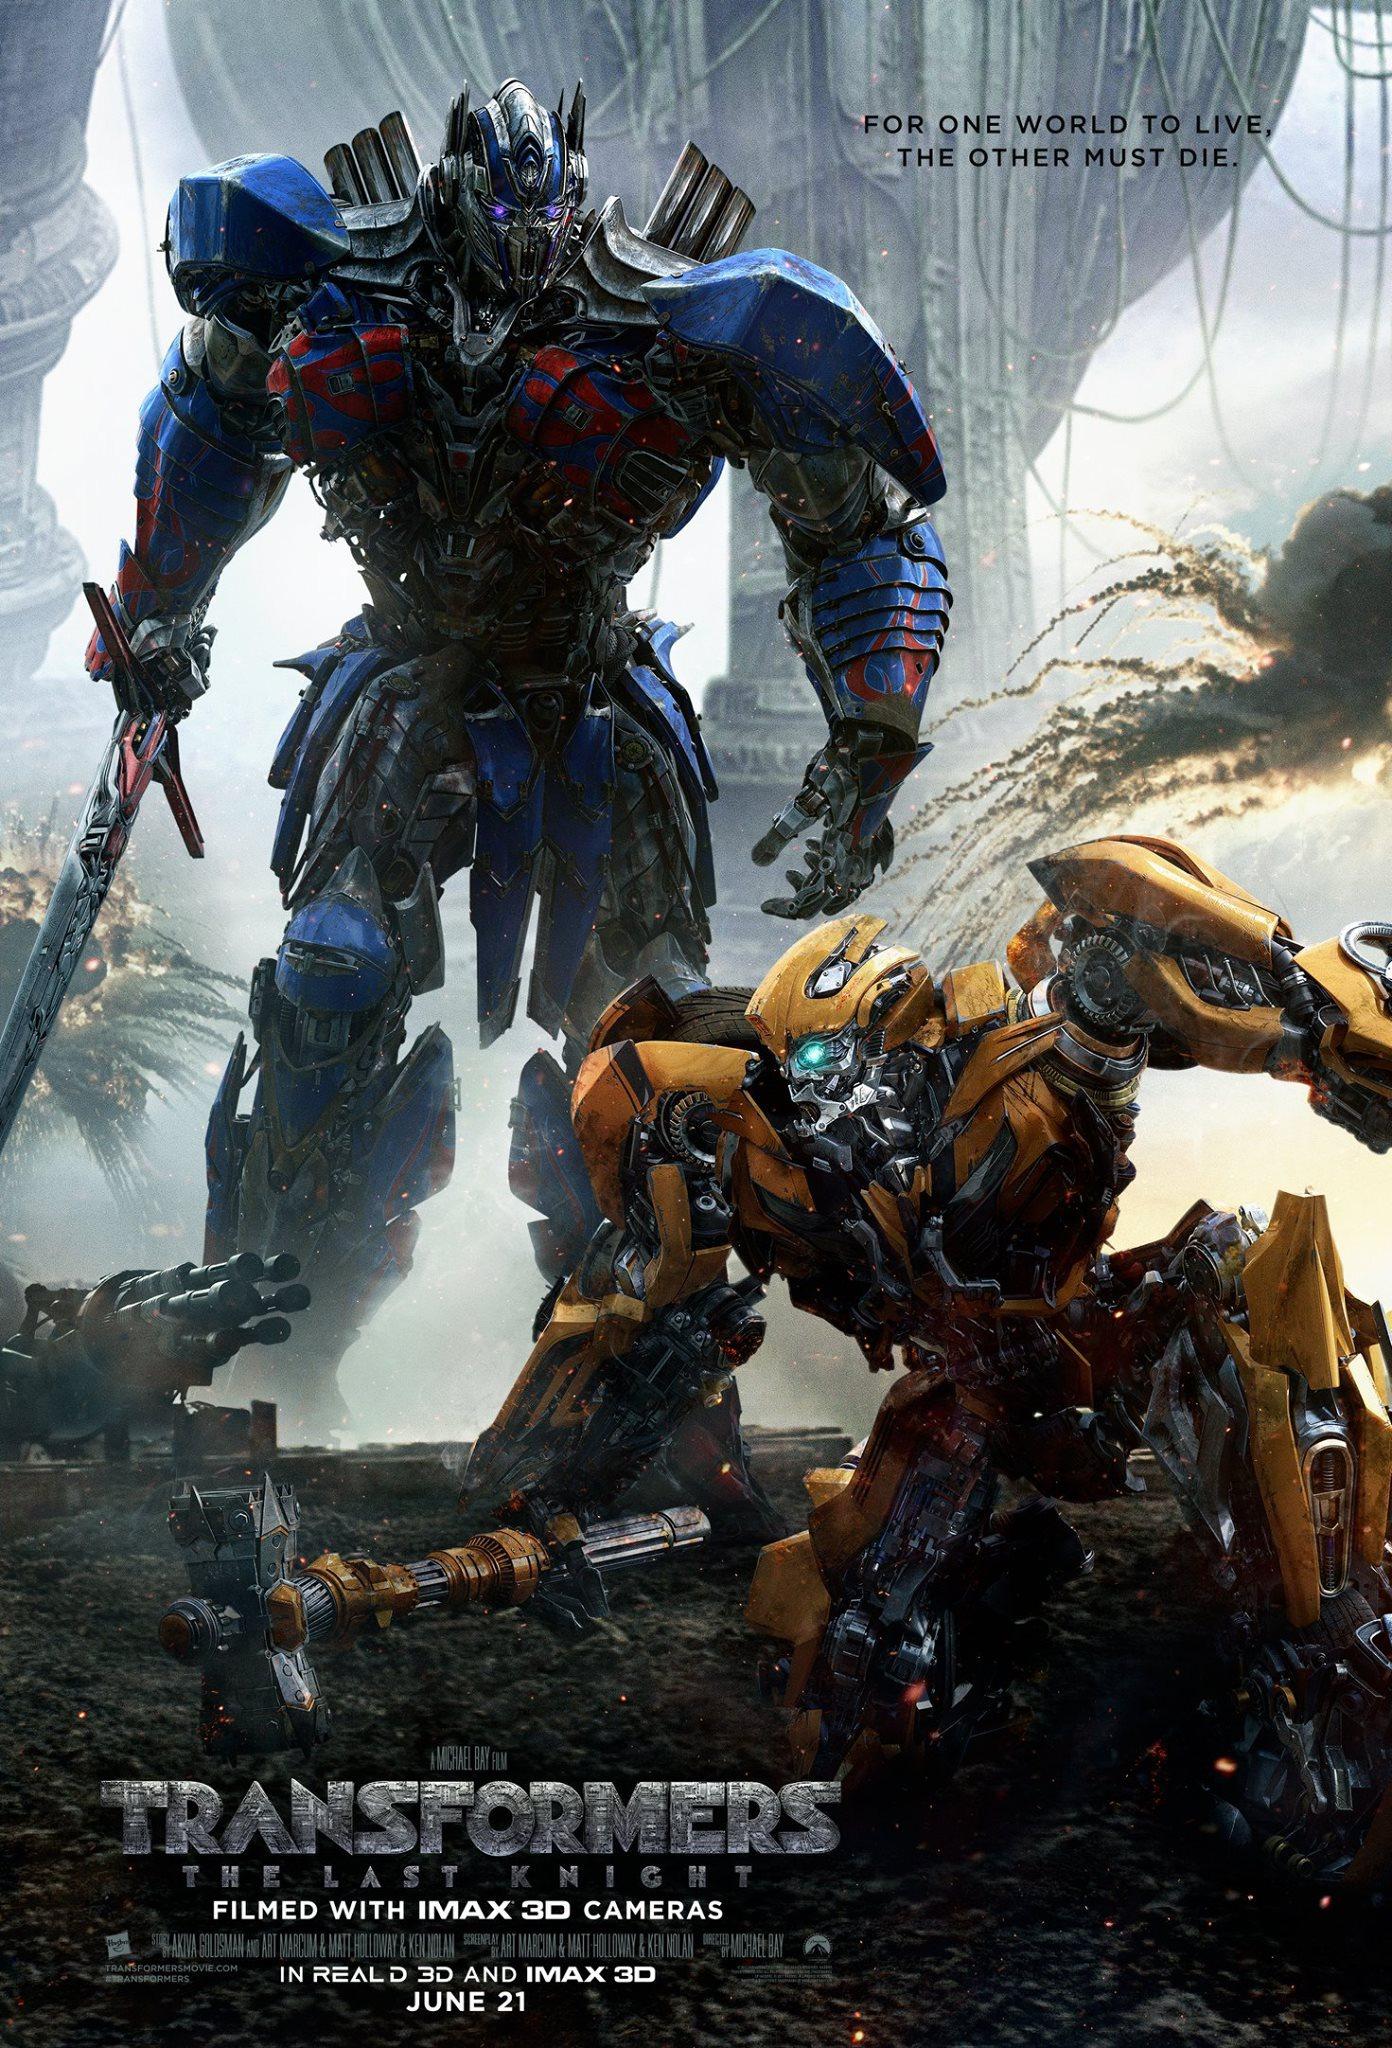 366-transformers_the_last_knight_ver4_xxlg.jpg